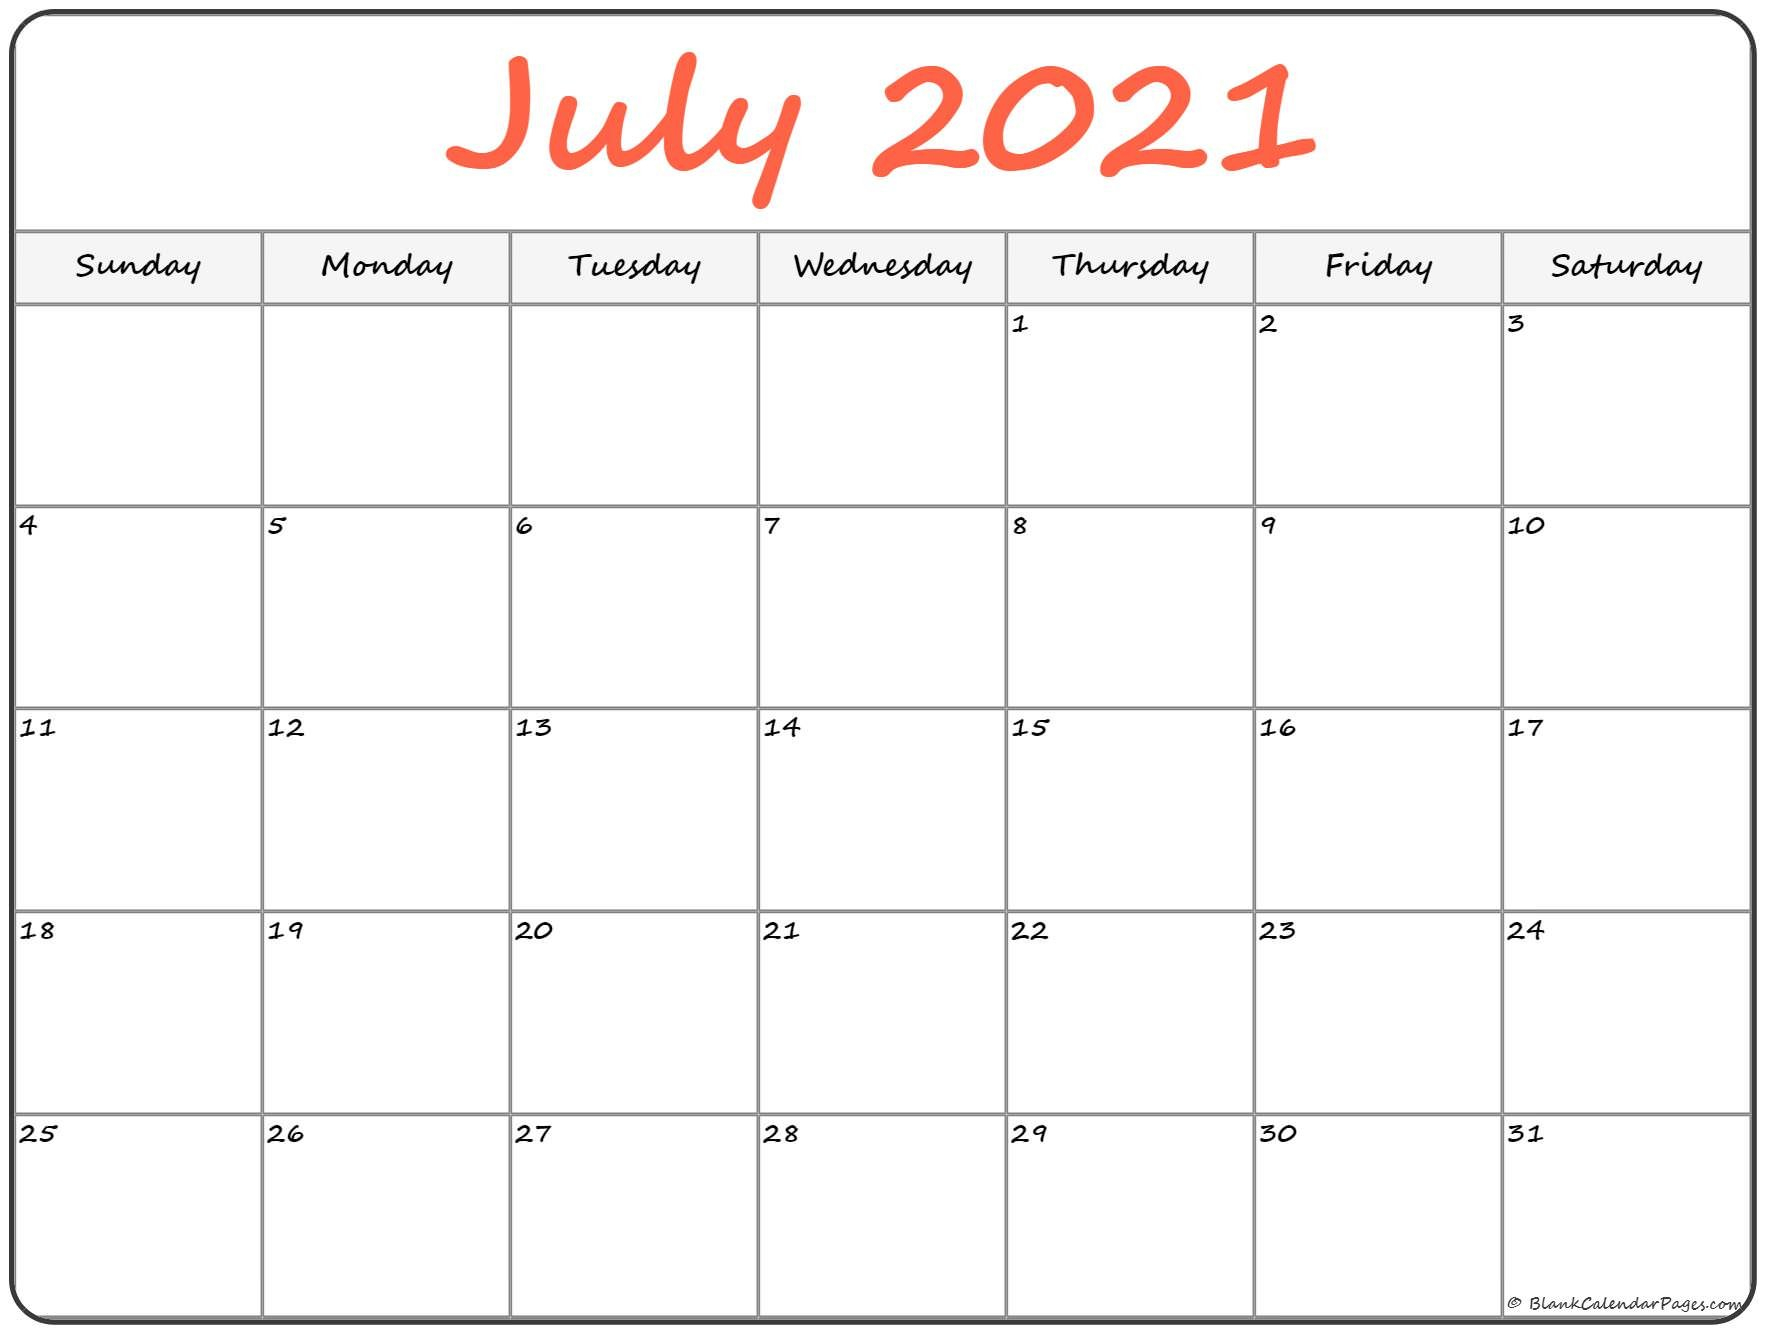 July 2021 Calendar   Free Printable Calendar Free Bold Printable Calnder Jully